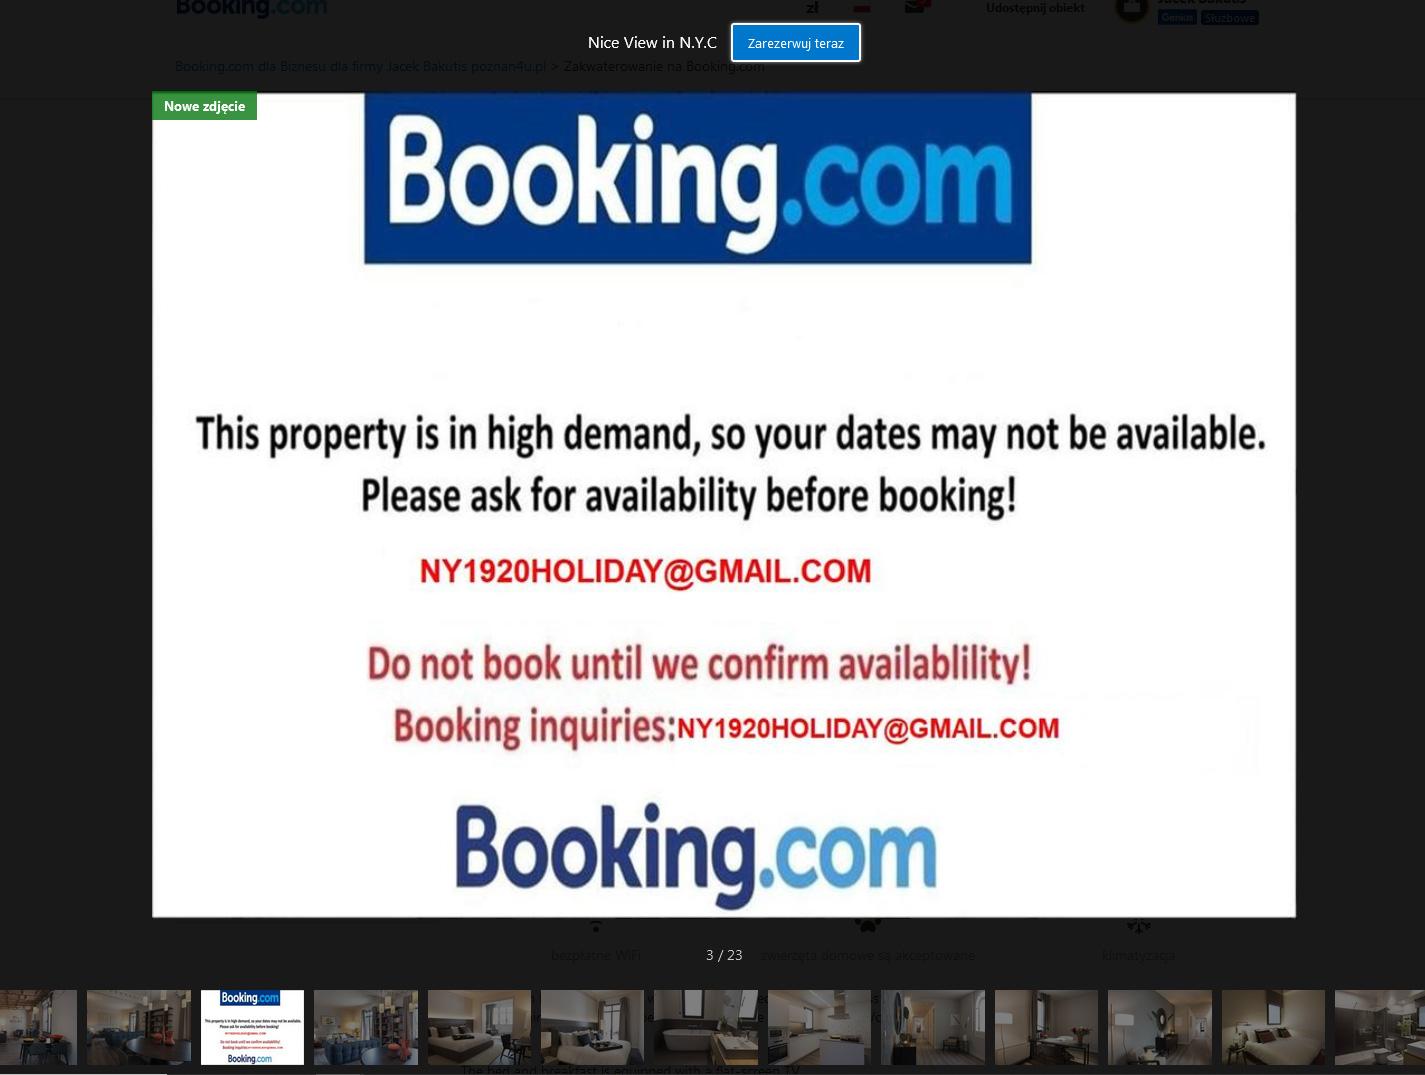 Fałszywy apartament na booking.com